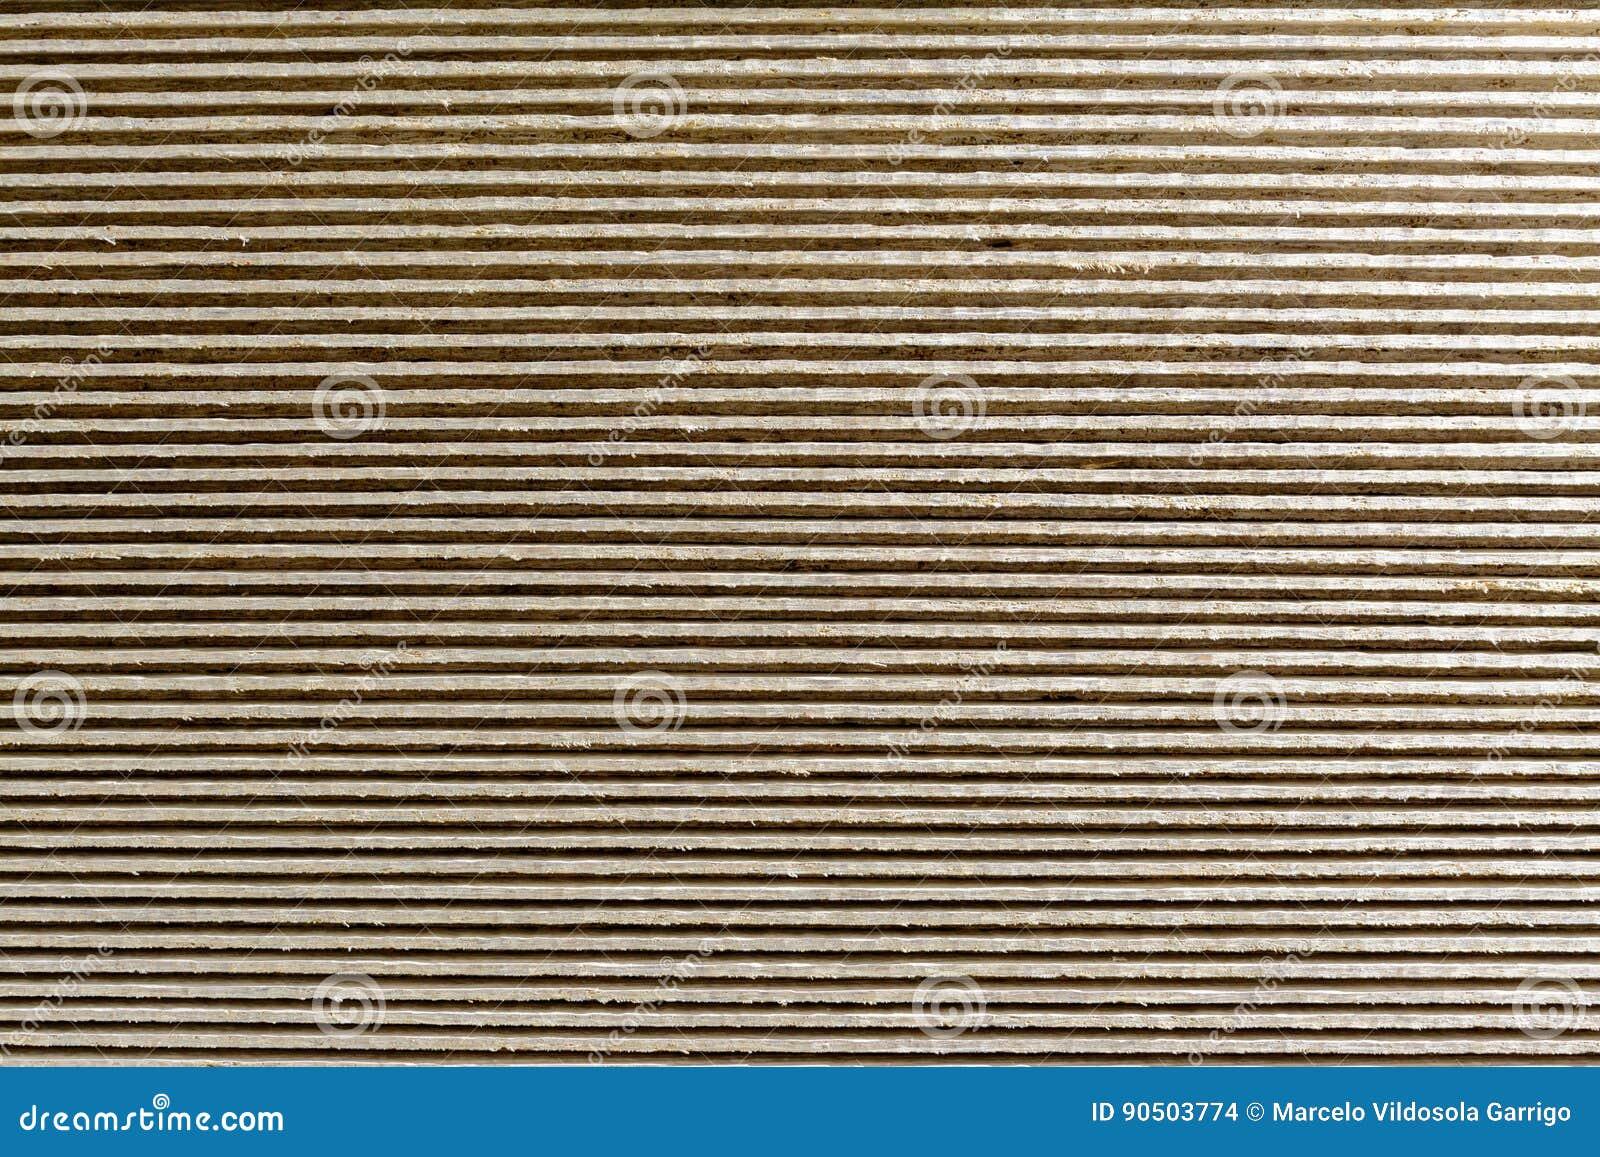 Texture de contreplaqué